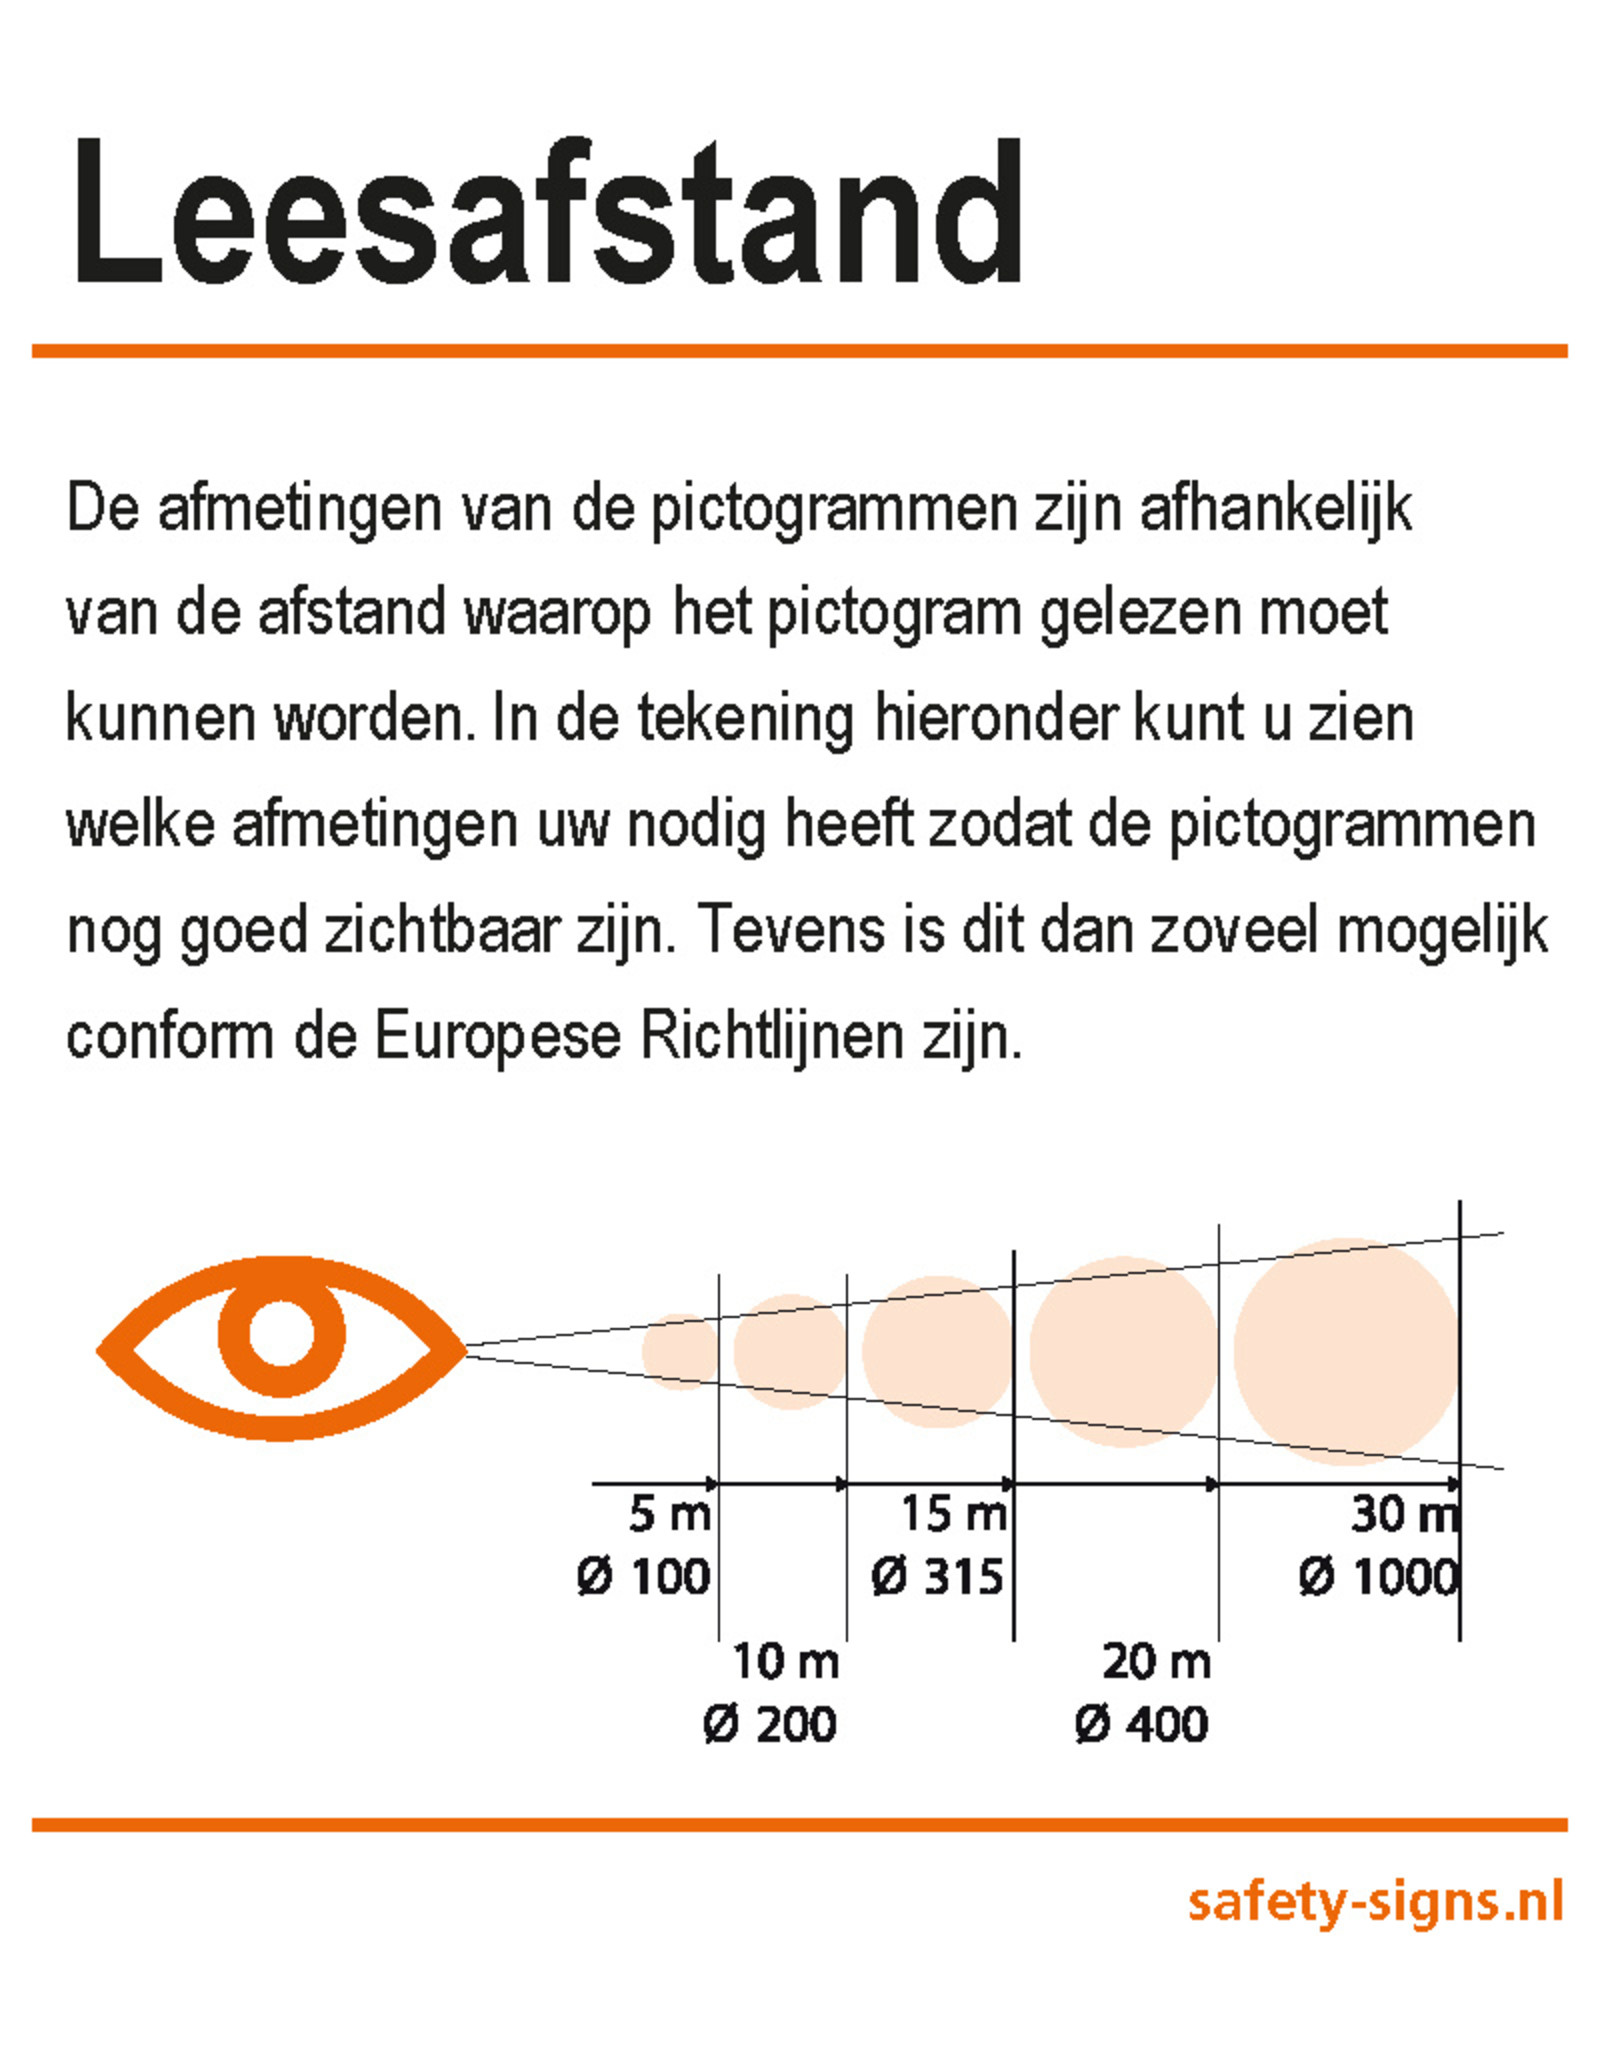 safety-signs.nl Verbod - Niet gebruiken ivm verspreiding corona